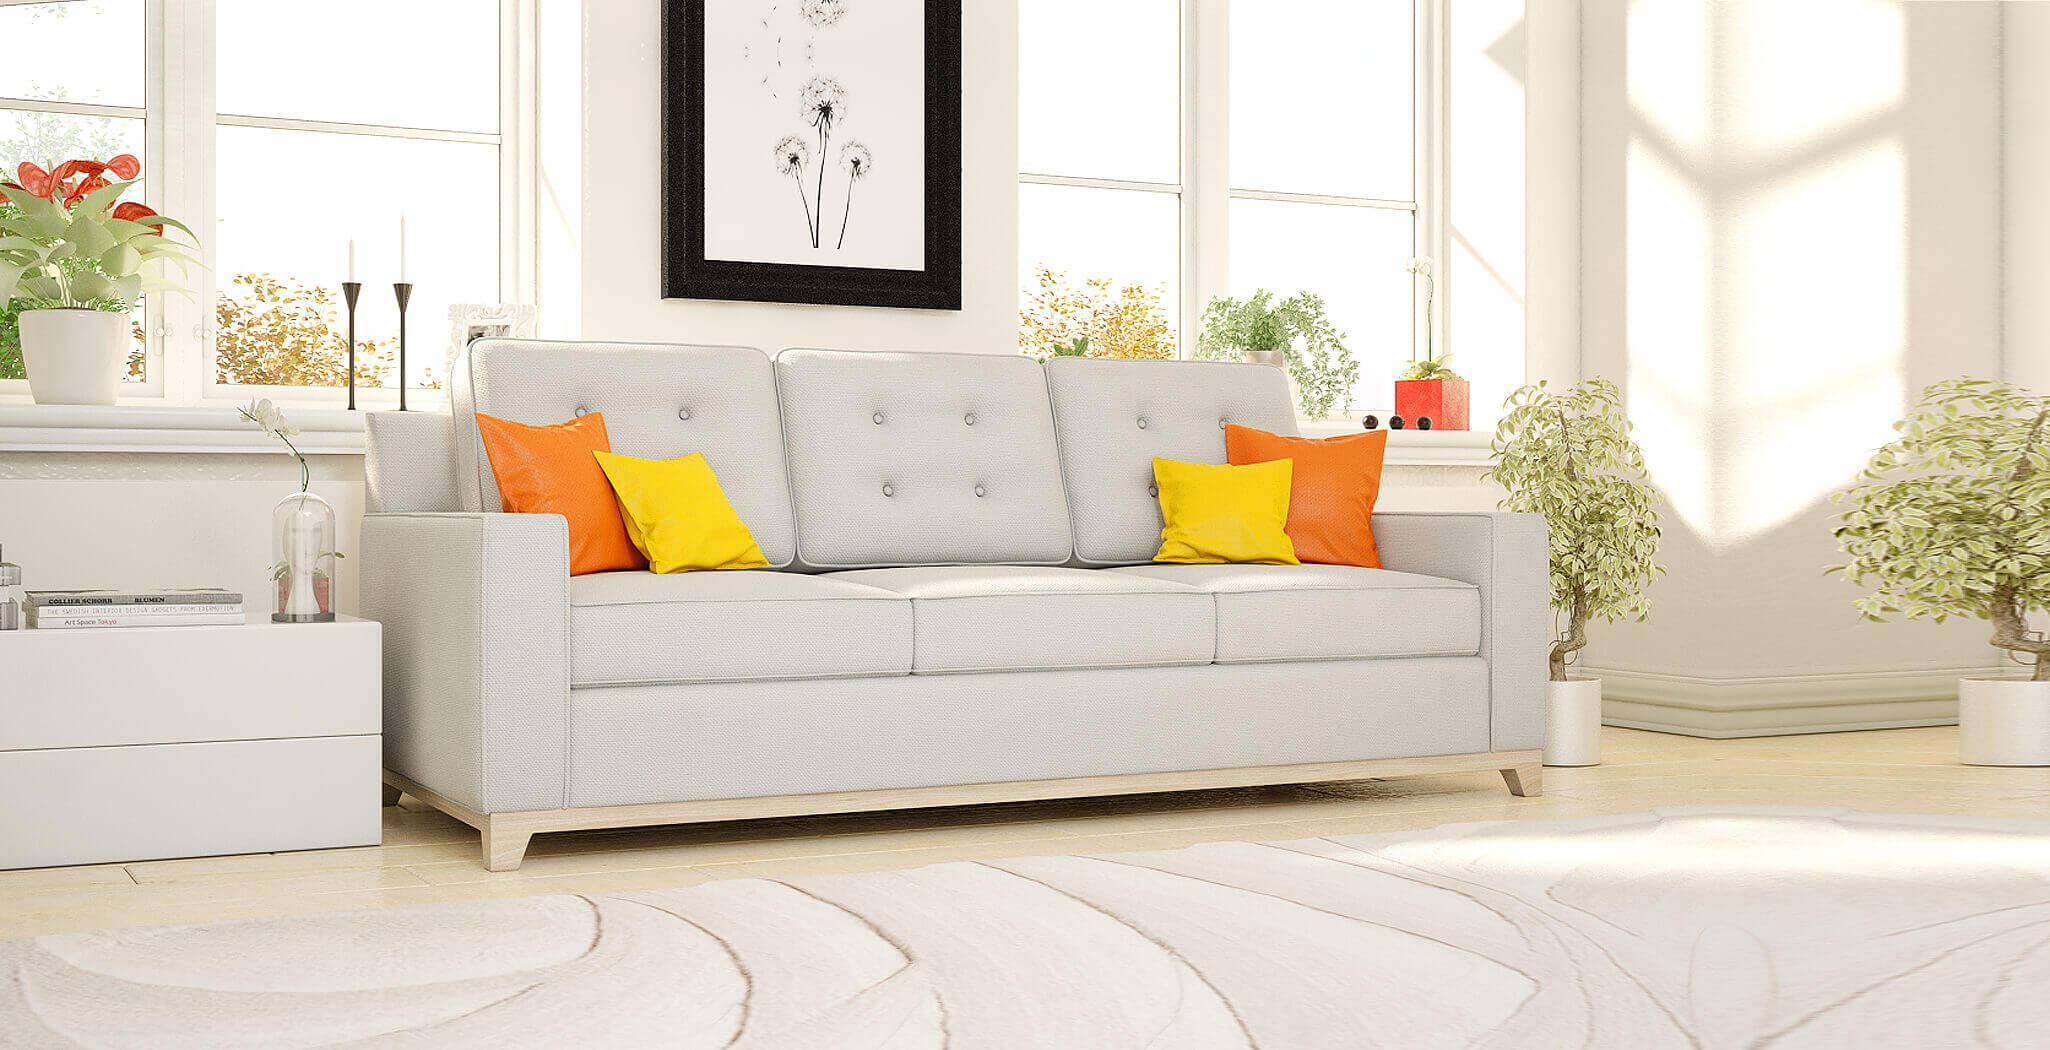 alexandria sofa furniture gallery 2